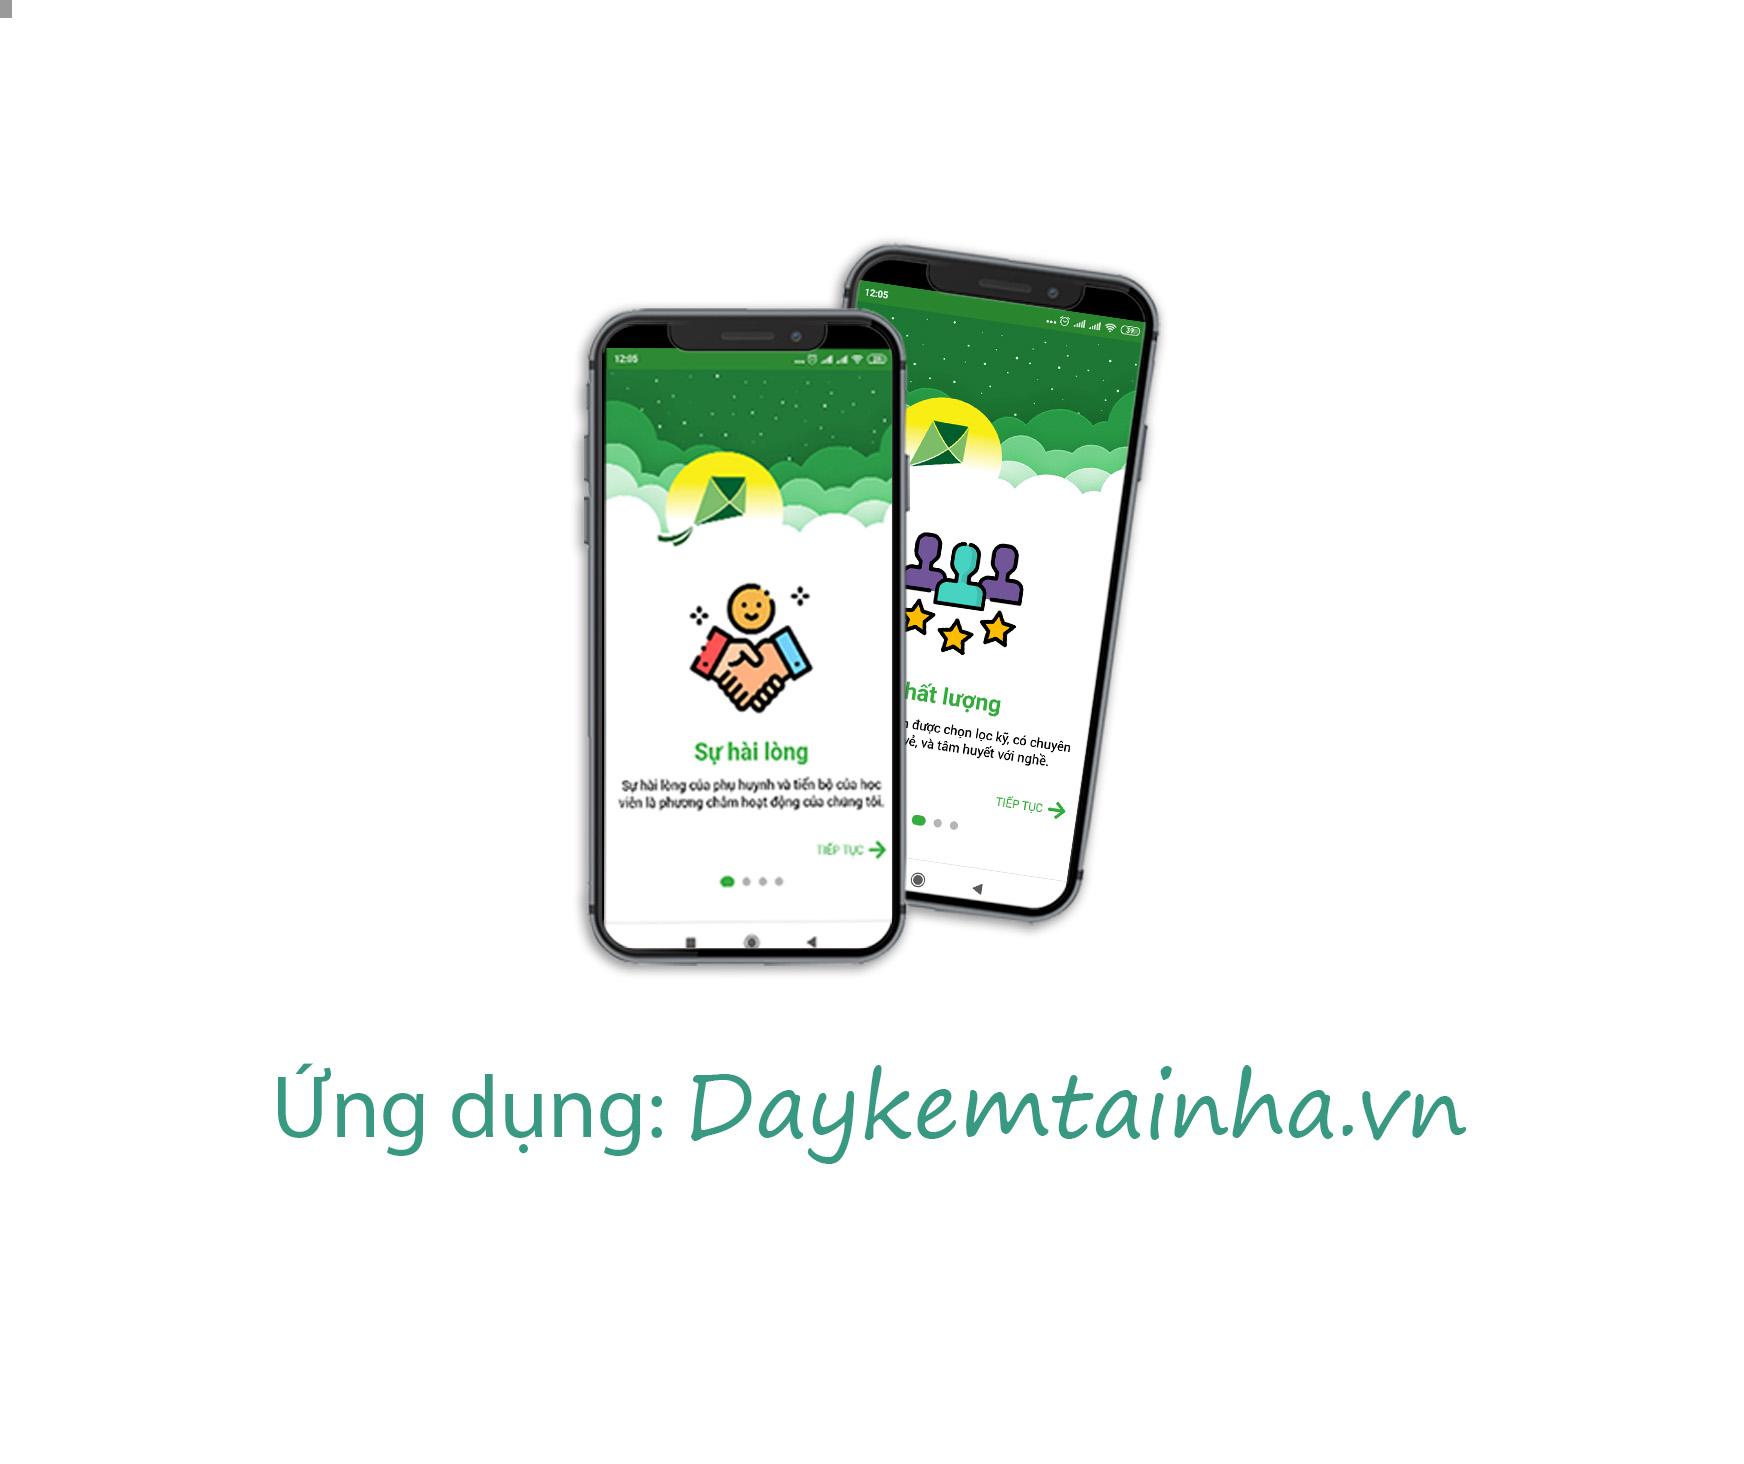 ung dung daykemtainha.vn